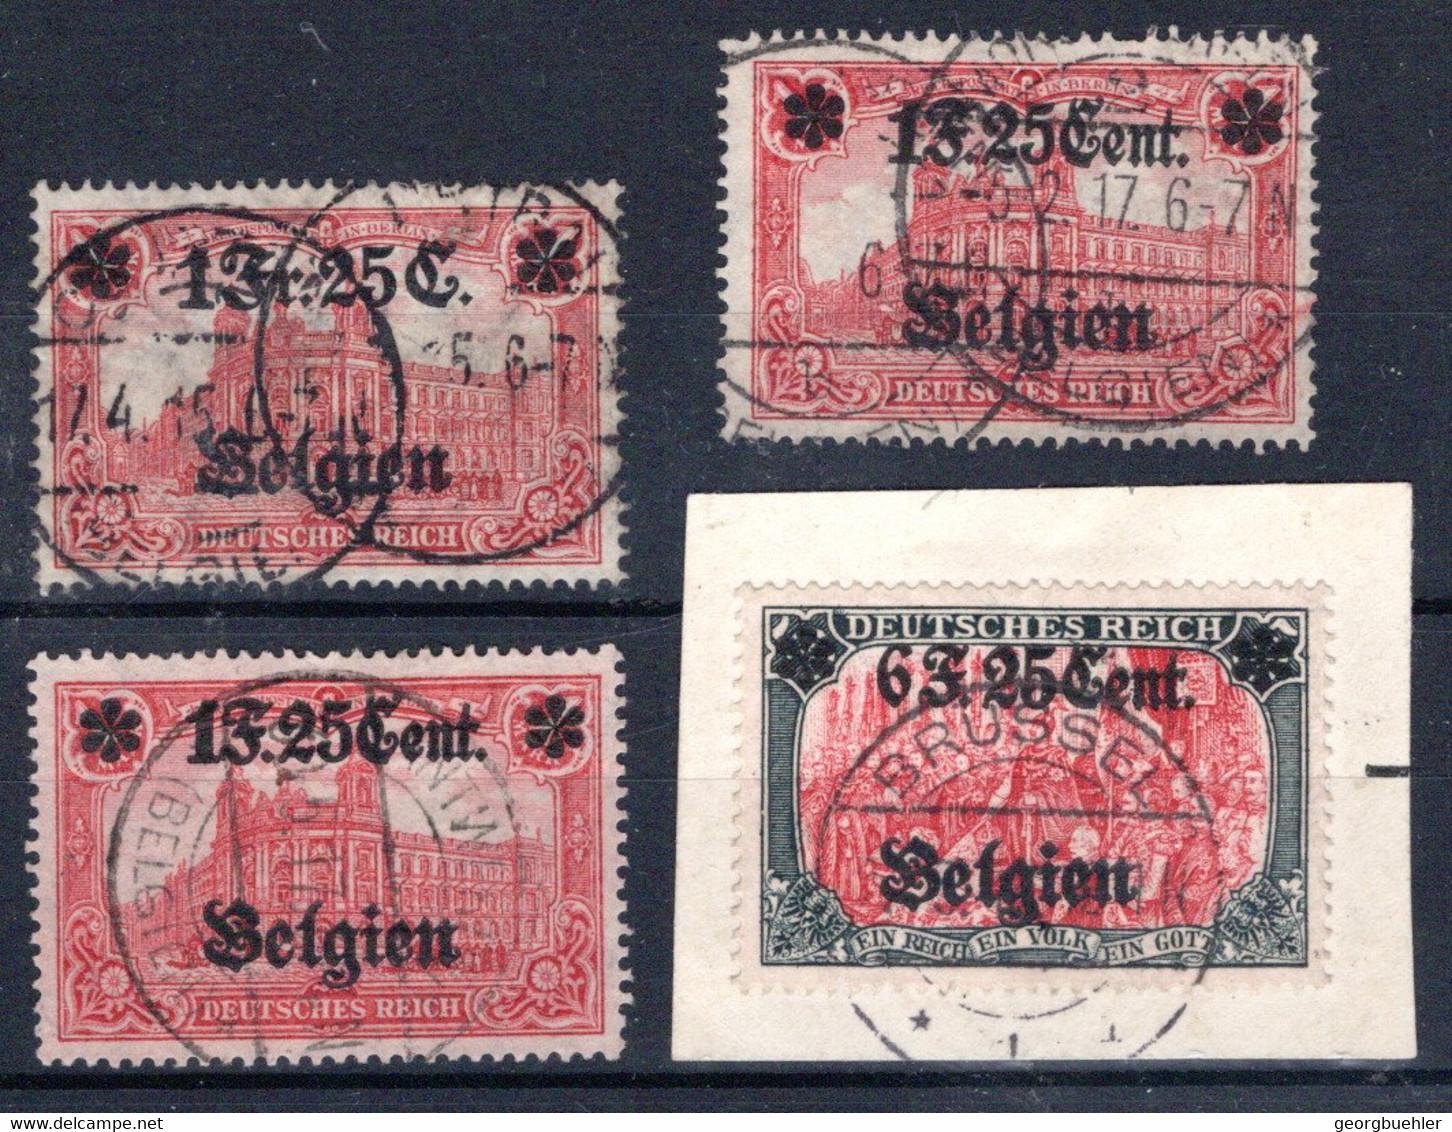 LANDESPOST IN BELGIEN, Michel No.: 23IA (2) USED, Cat. Value: 400€ - Occupation 1914-18